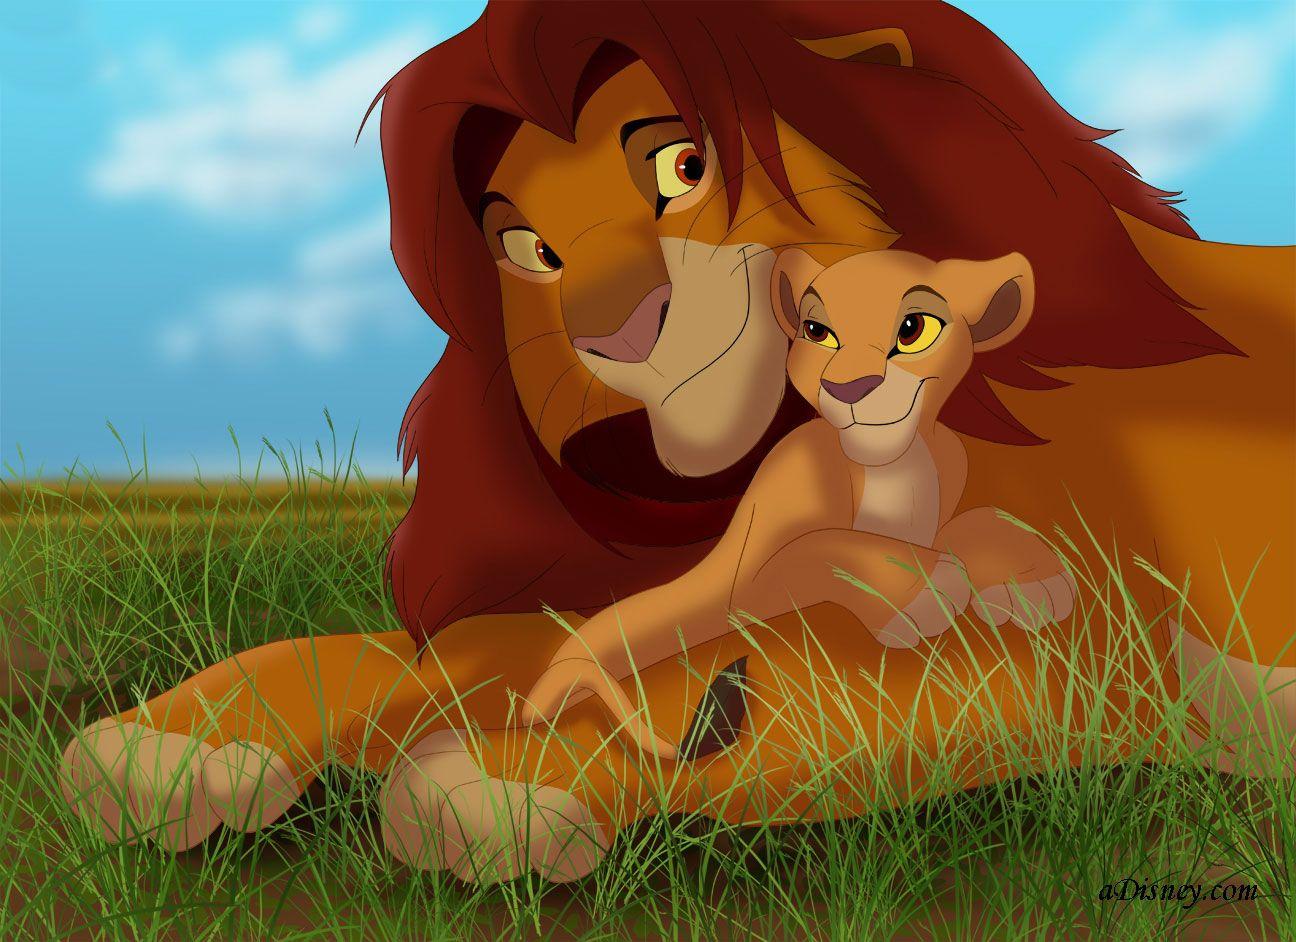 Lion King 2 | Simba and Kiara - The Lion King 2:Simba\'s Pride Photo ...